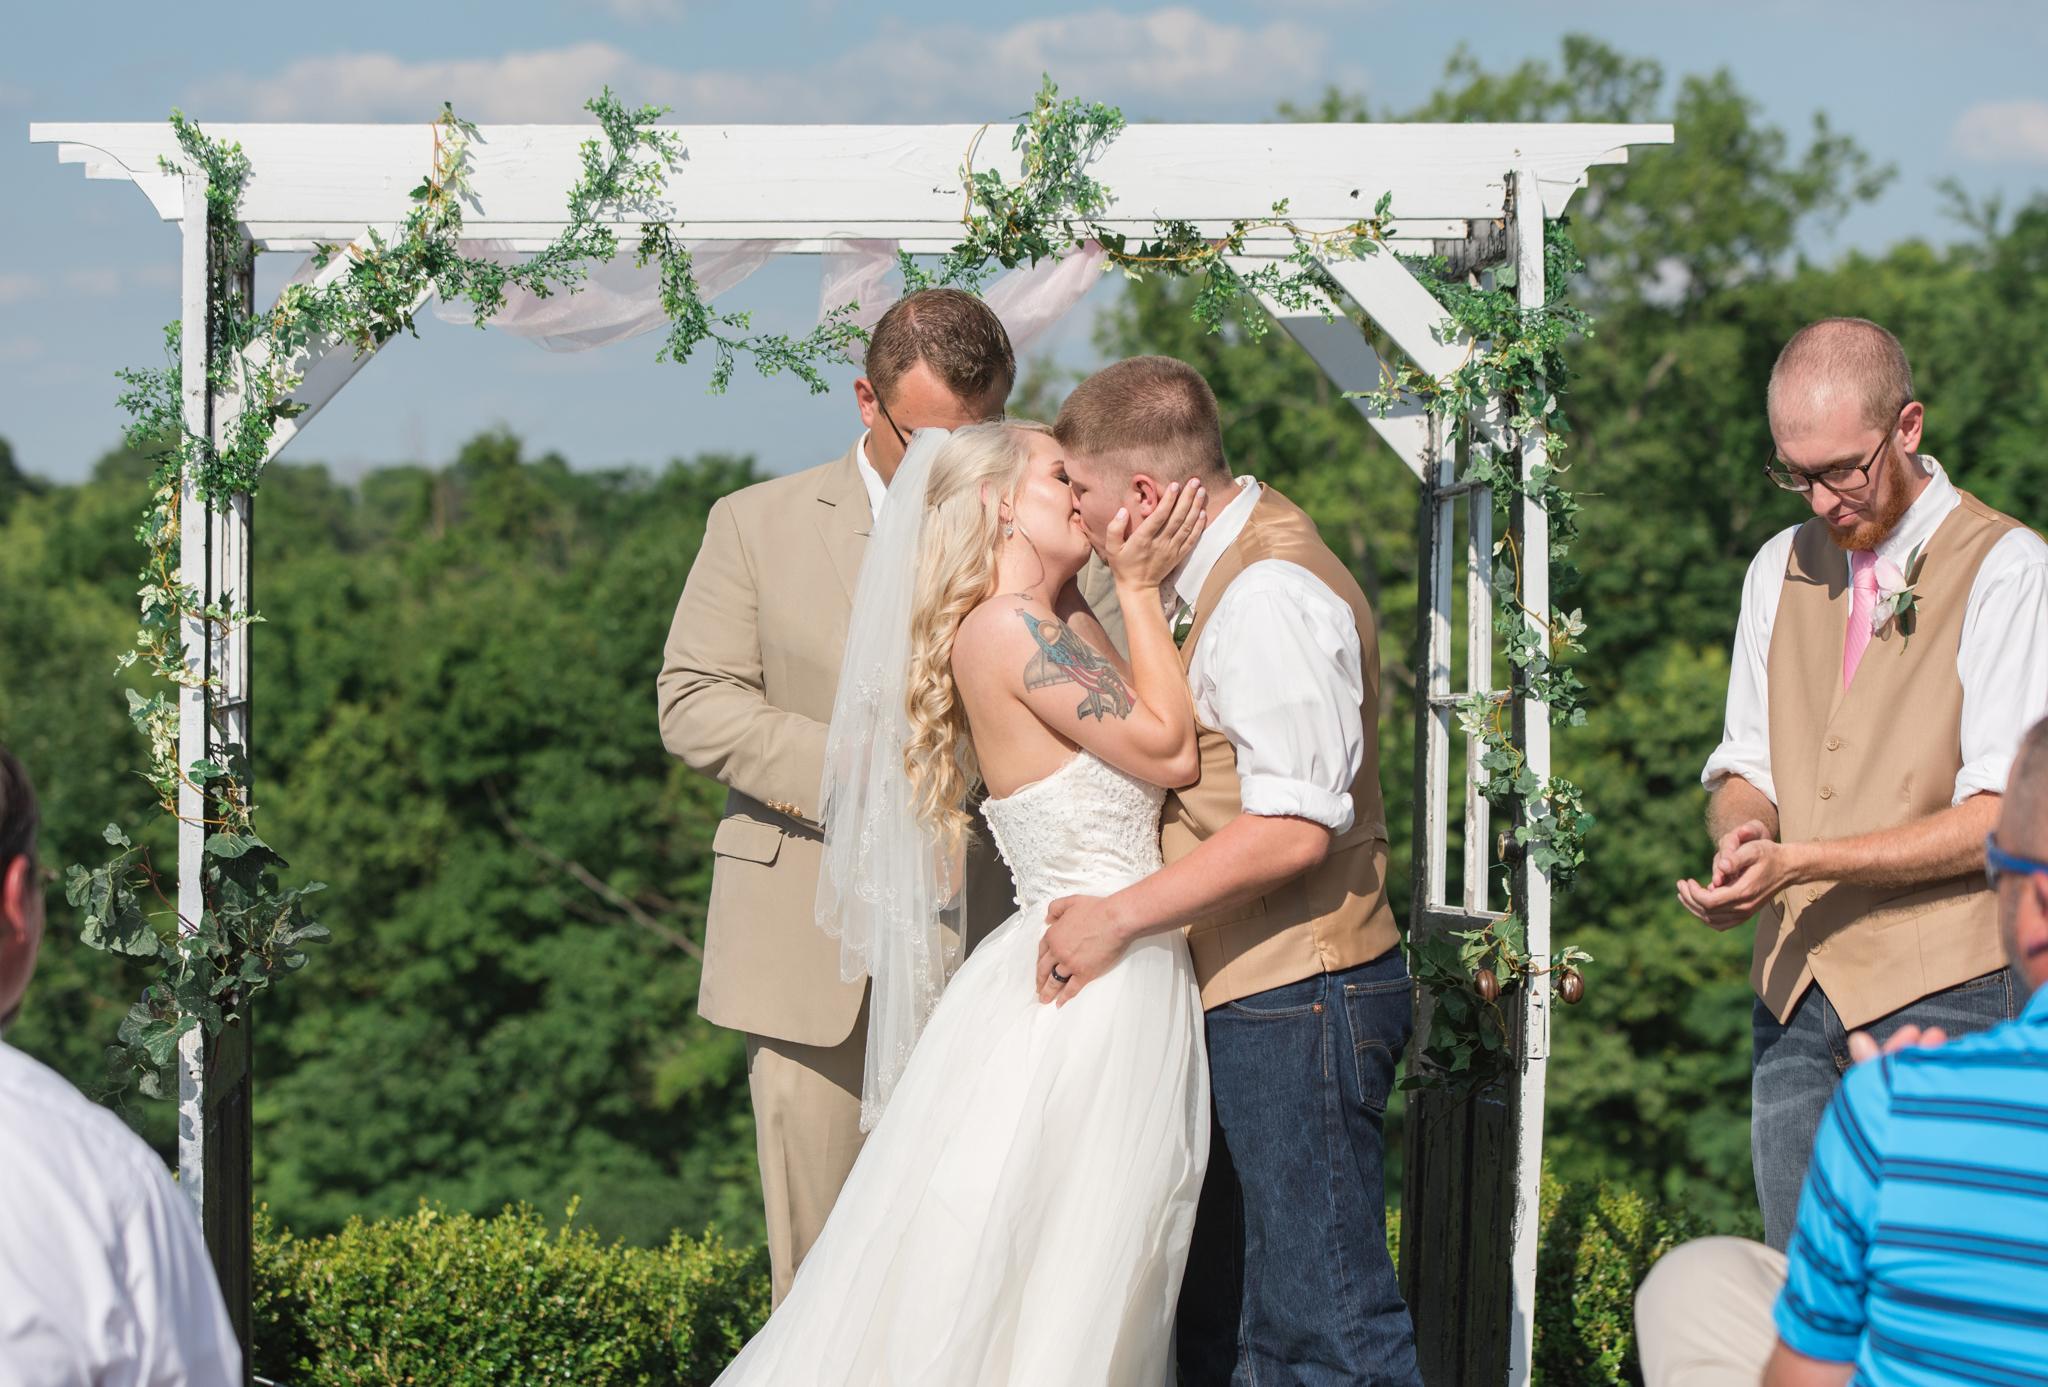 first kiss, bride and groom, Kentucky wedding photographer, Josephina Event venue, barn wedding, KY bride, Dry Ridge, Lexington, Somerset, Louisville, Ashland, Winchester, Campton, Mt Sterling, West Chester